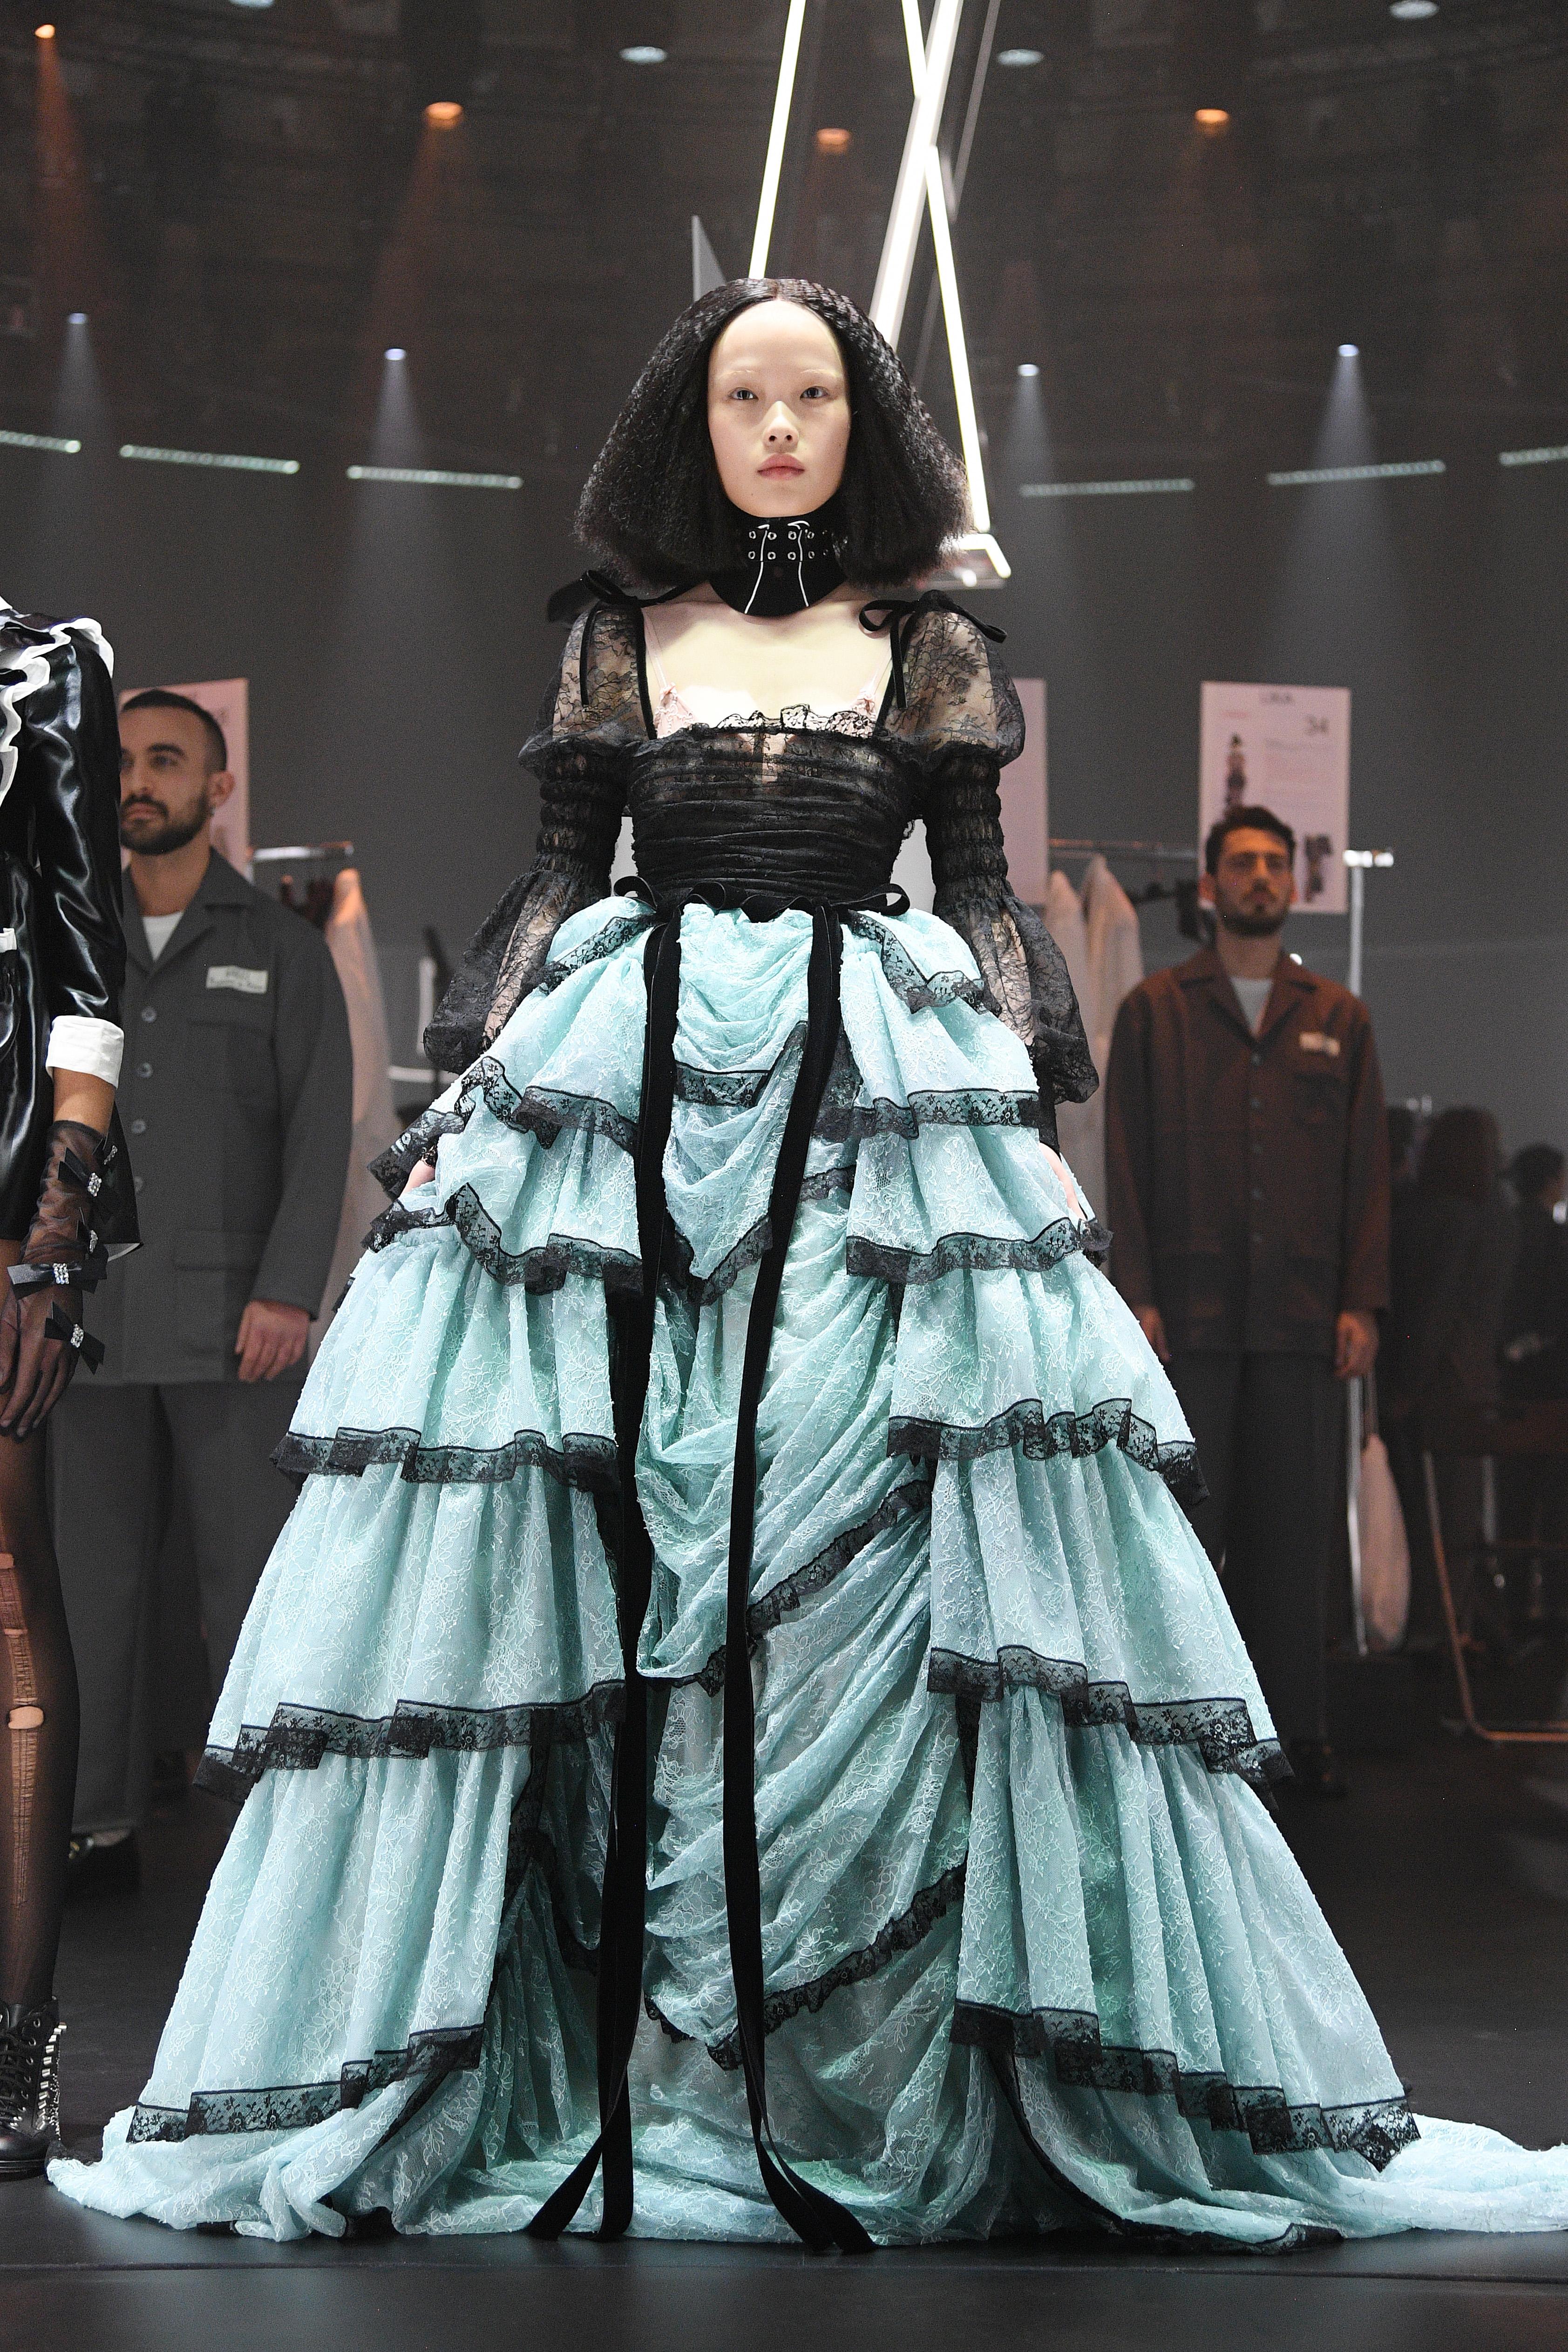 Gucci / Fall 2018 / Milan | Fashion, Art clothes, Runway